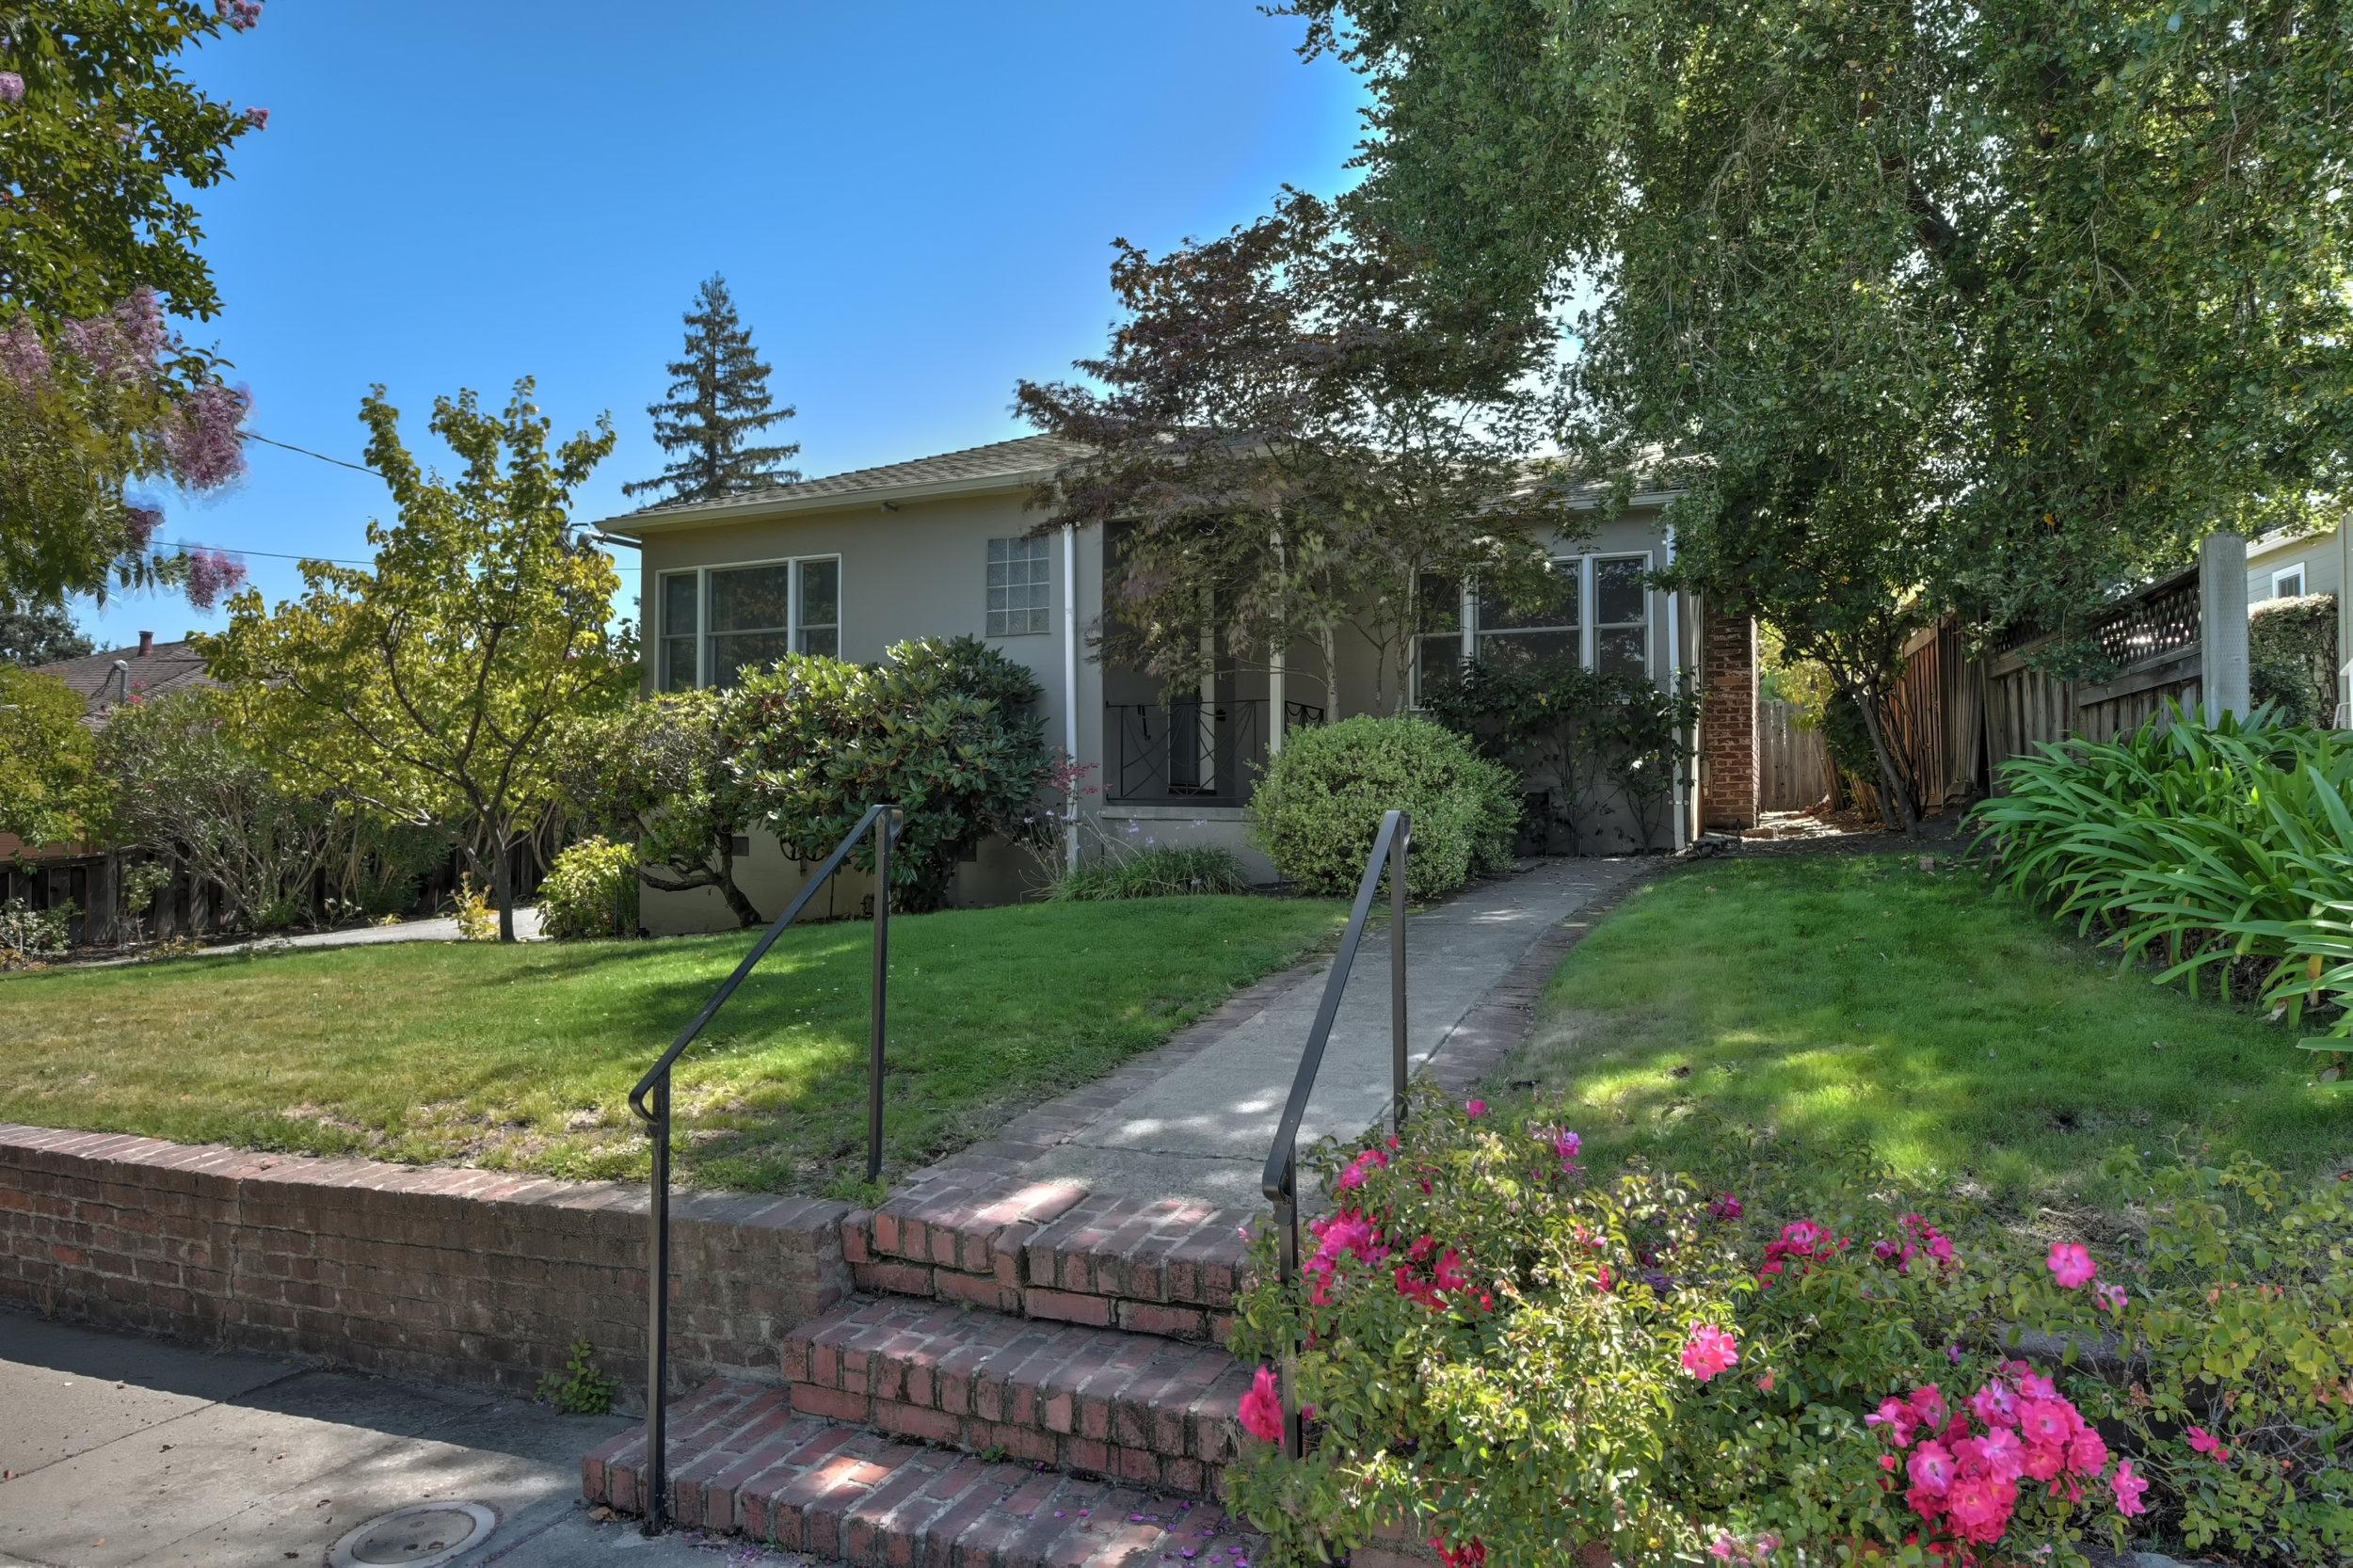 2439 Brewster Ave, Redwood City, CA | $1,750,000